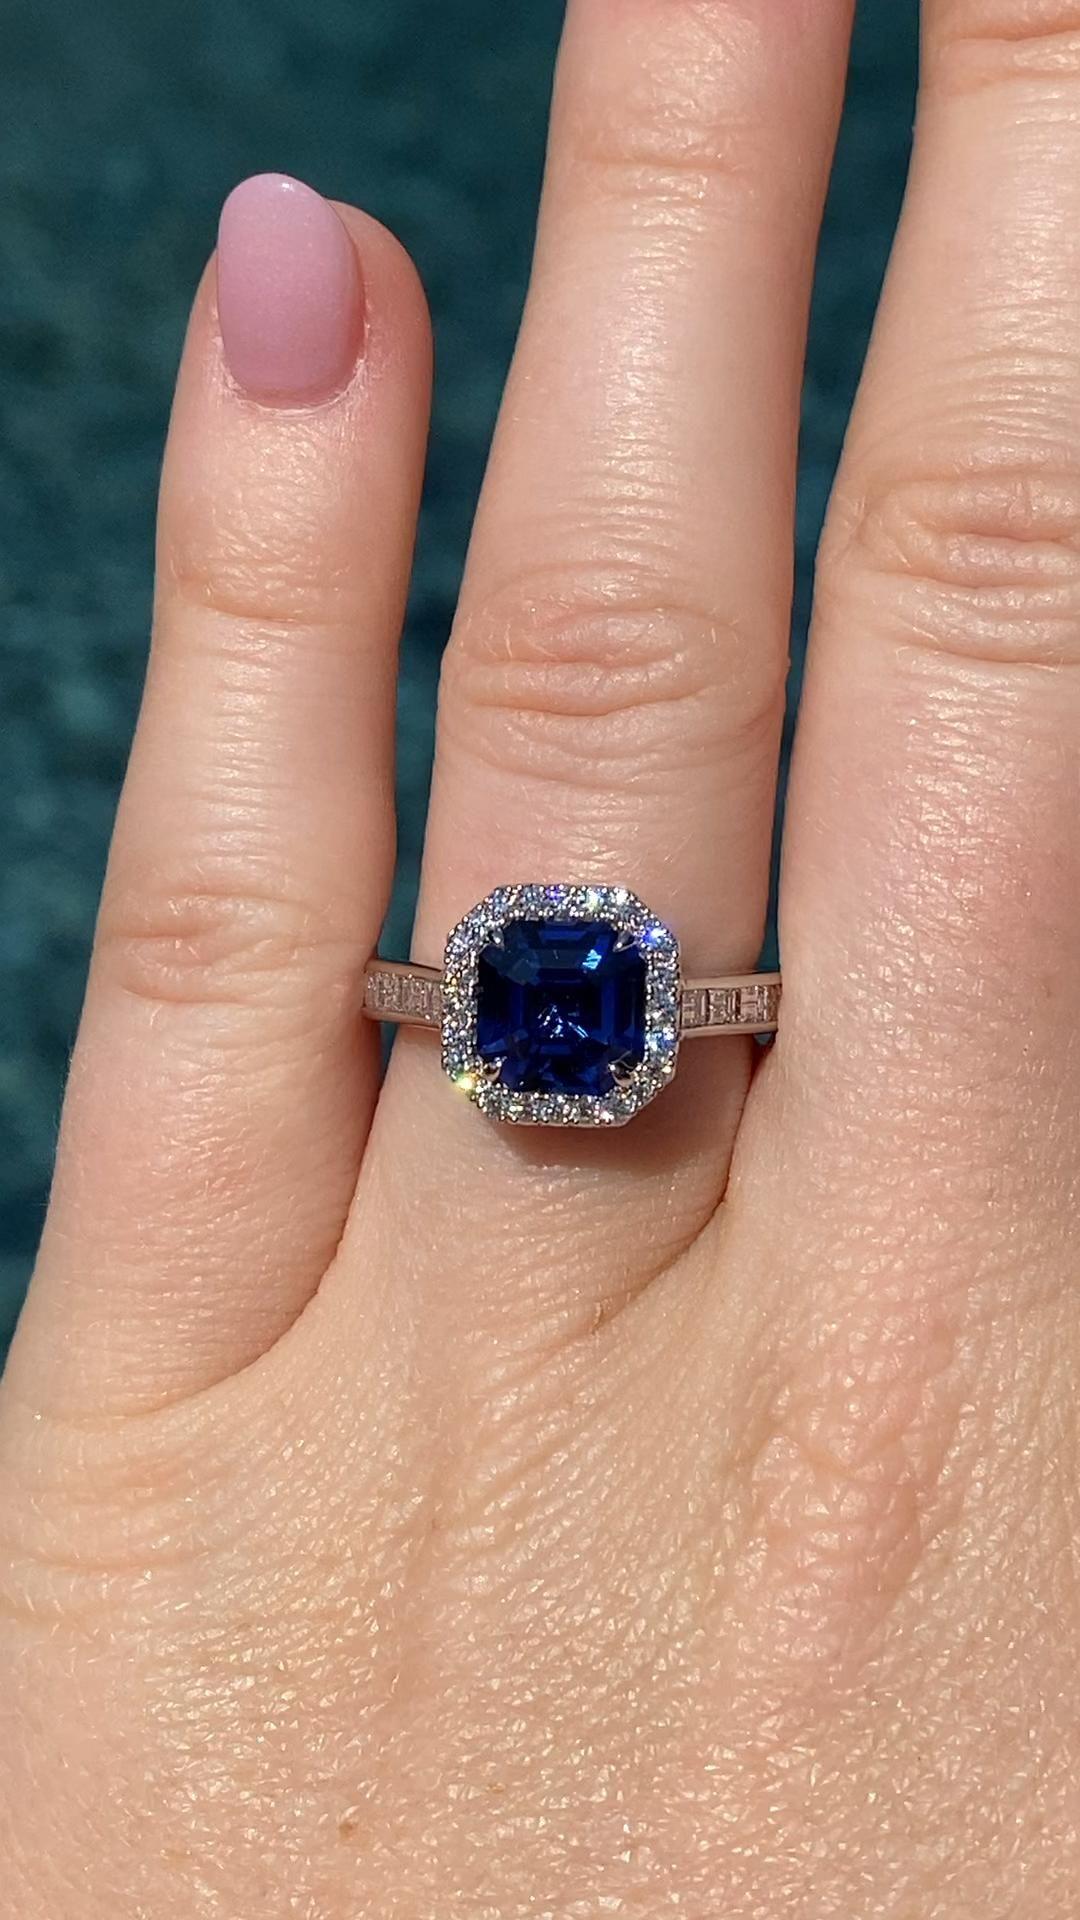 Genuine Montana Sapphire Color Change Pale Blue Green to Pink Purple Princess cut Pendant in 14 karat Yellow Gold